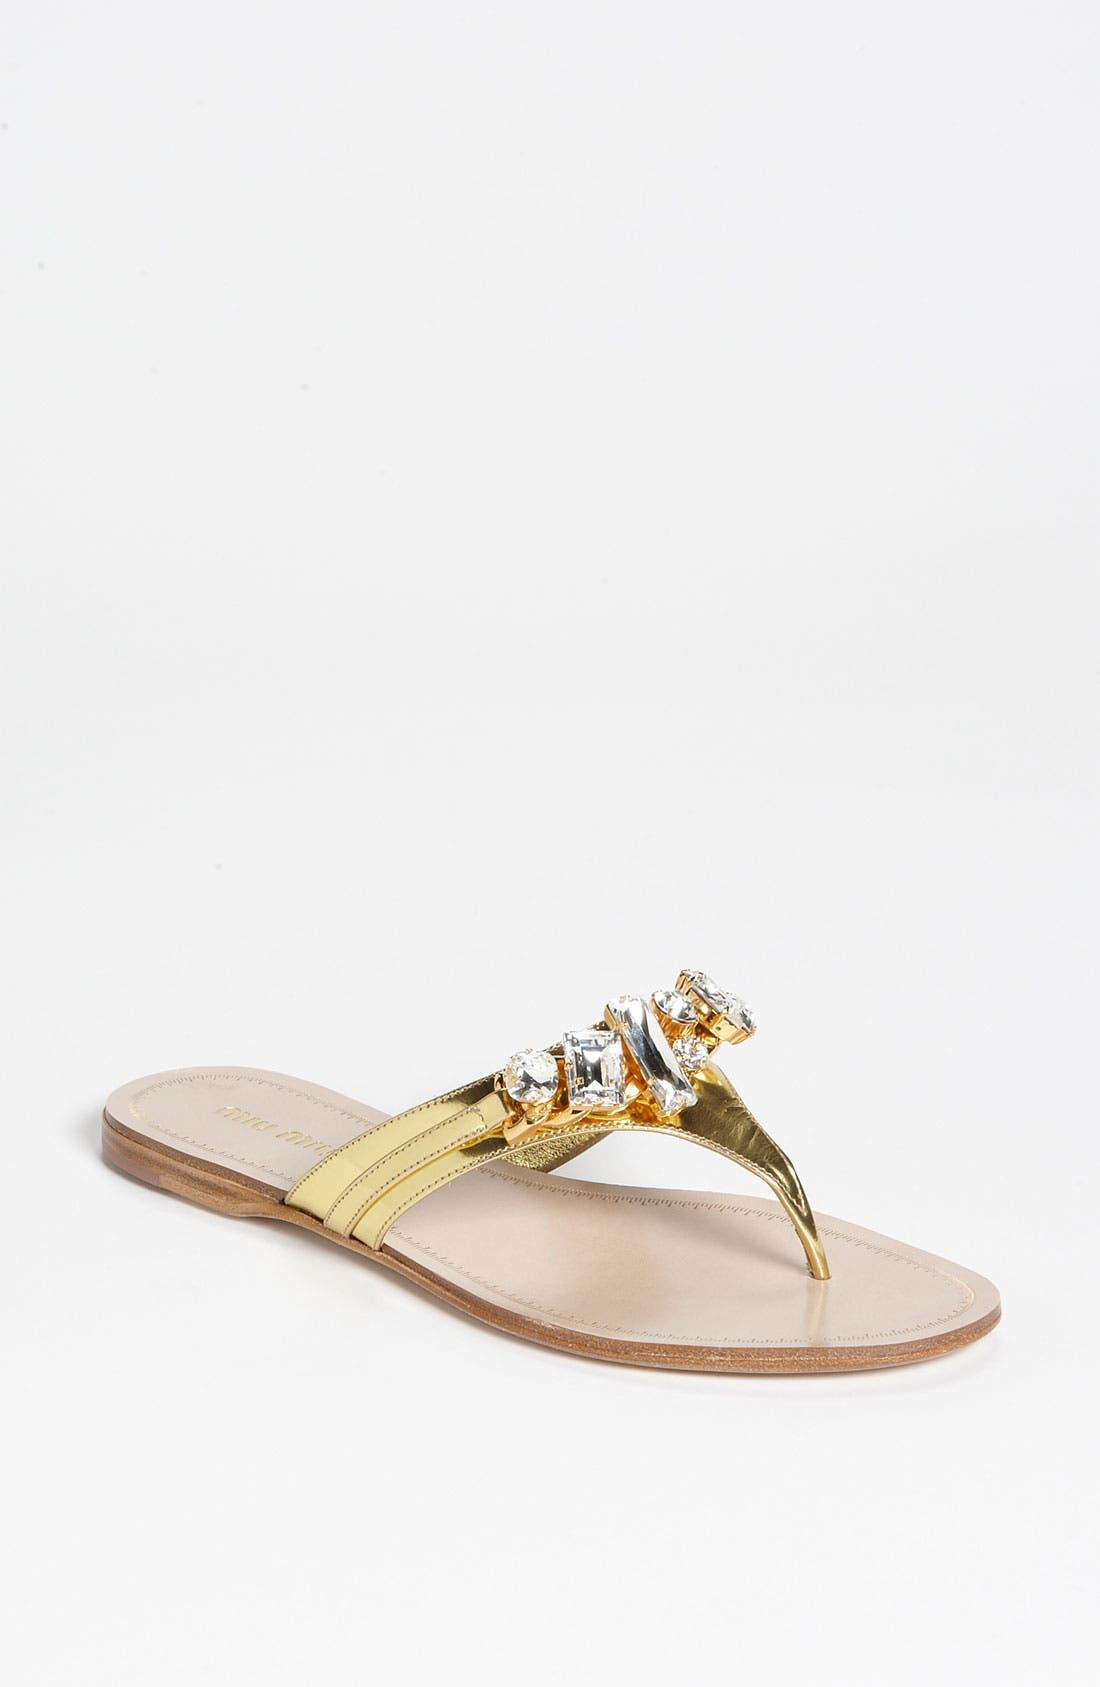 Main Image - Miu Miu Jeweled Thong Sandal